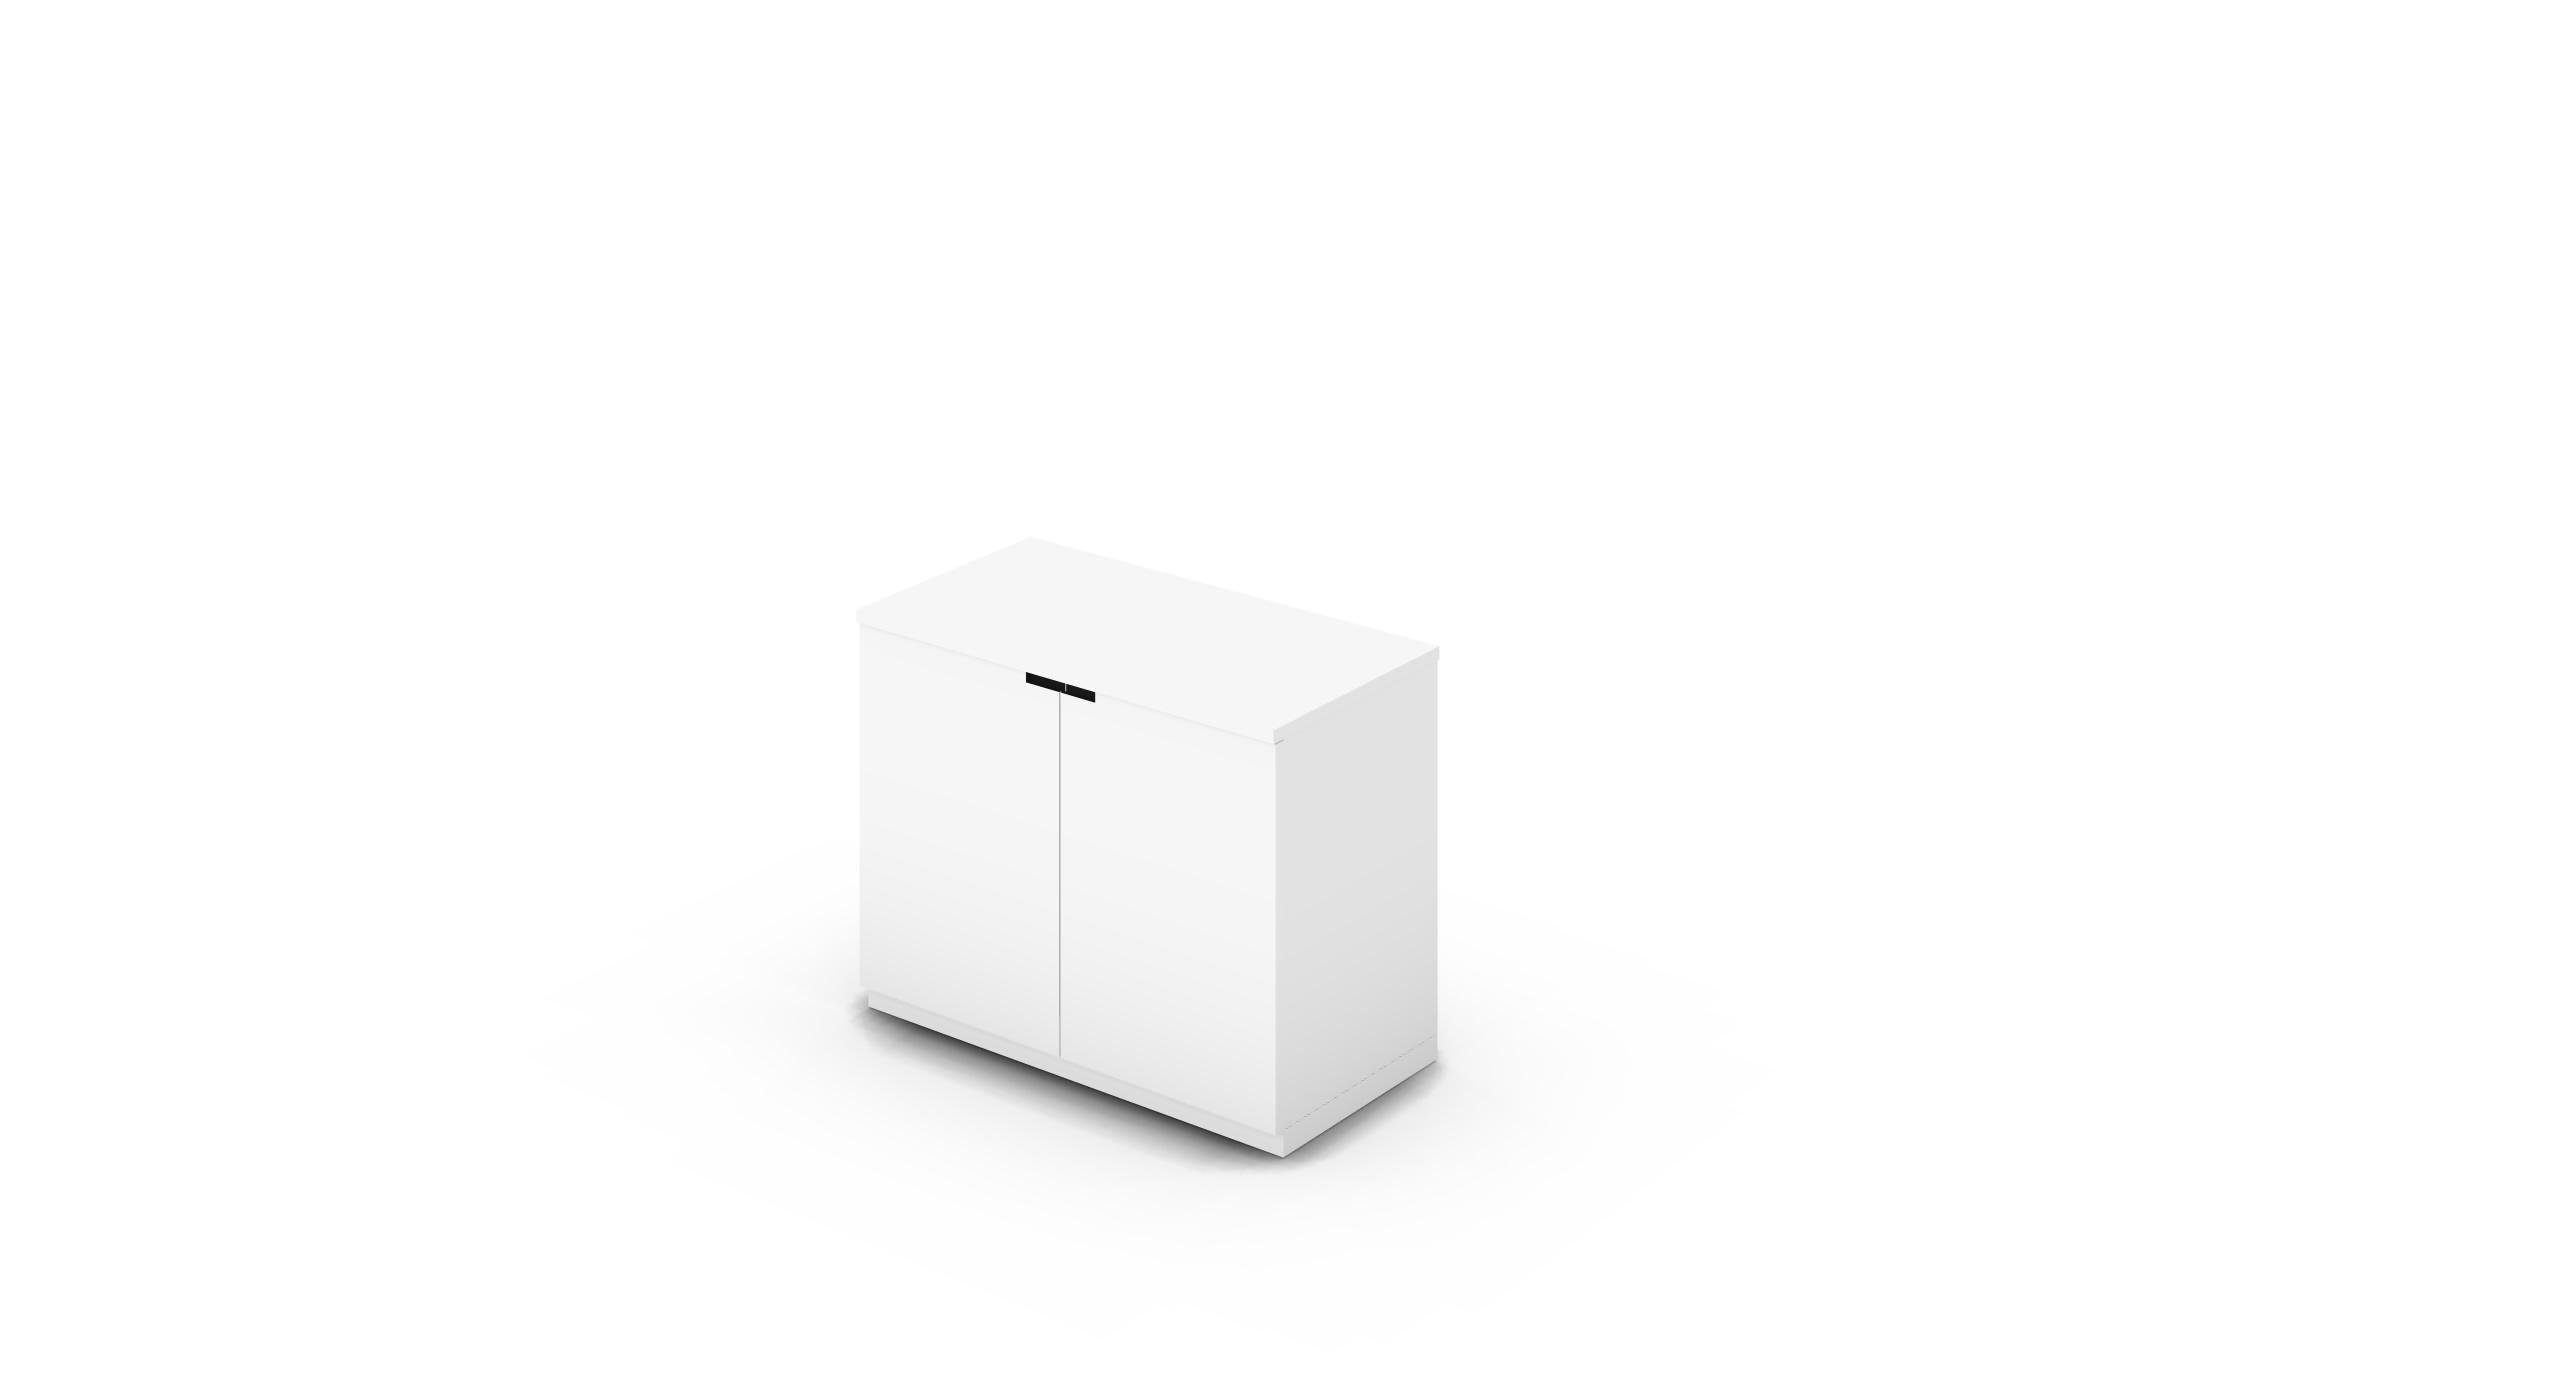 Cabinet_900x450x775_HD_White_CutOut_NoCylinder